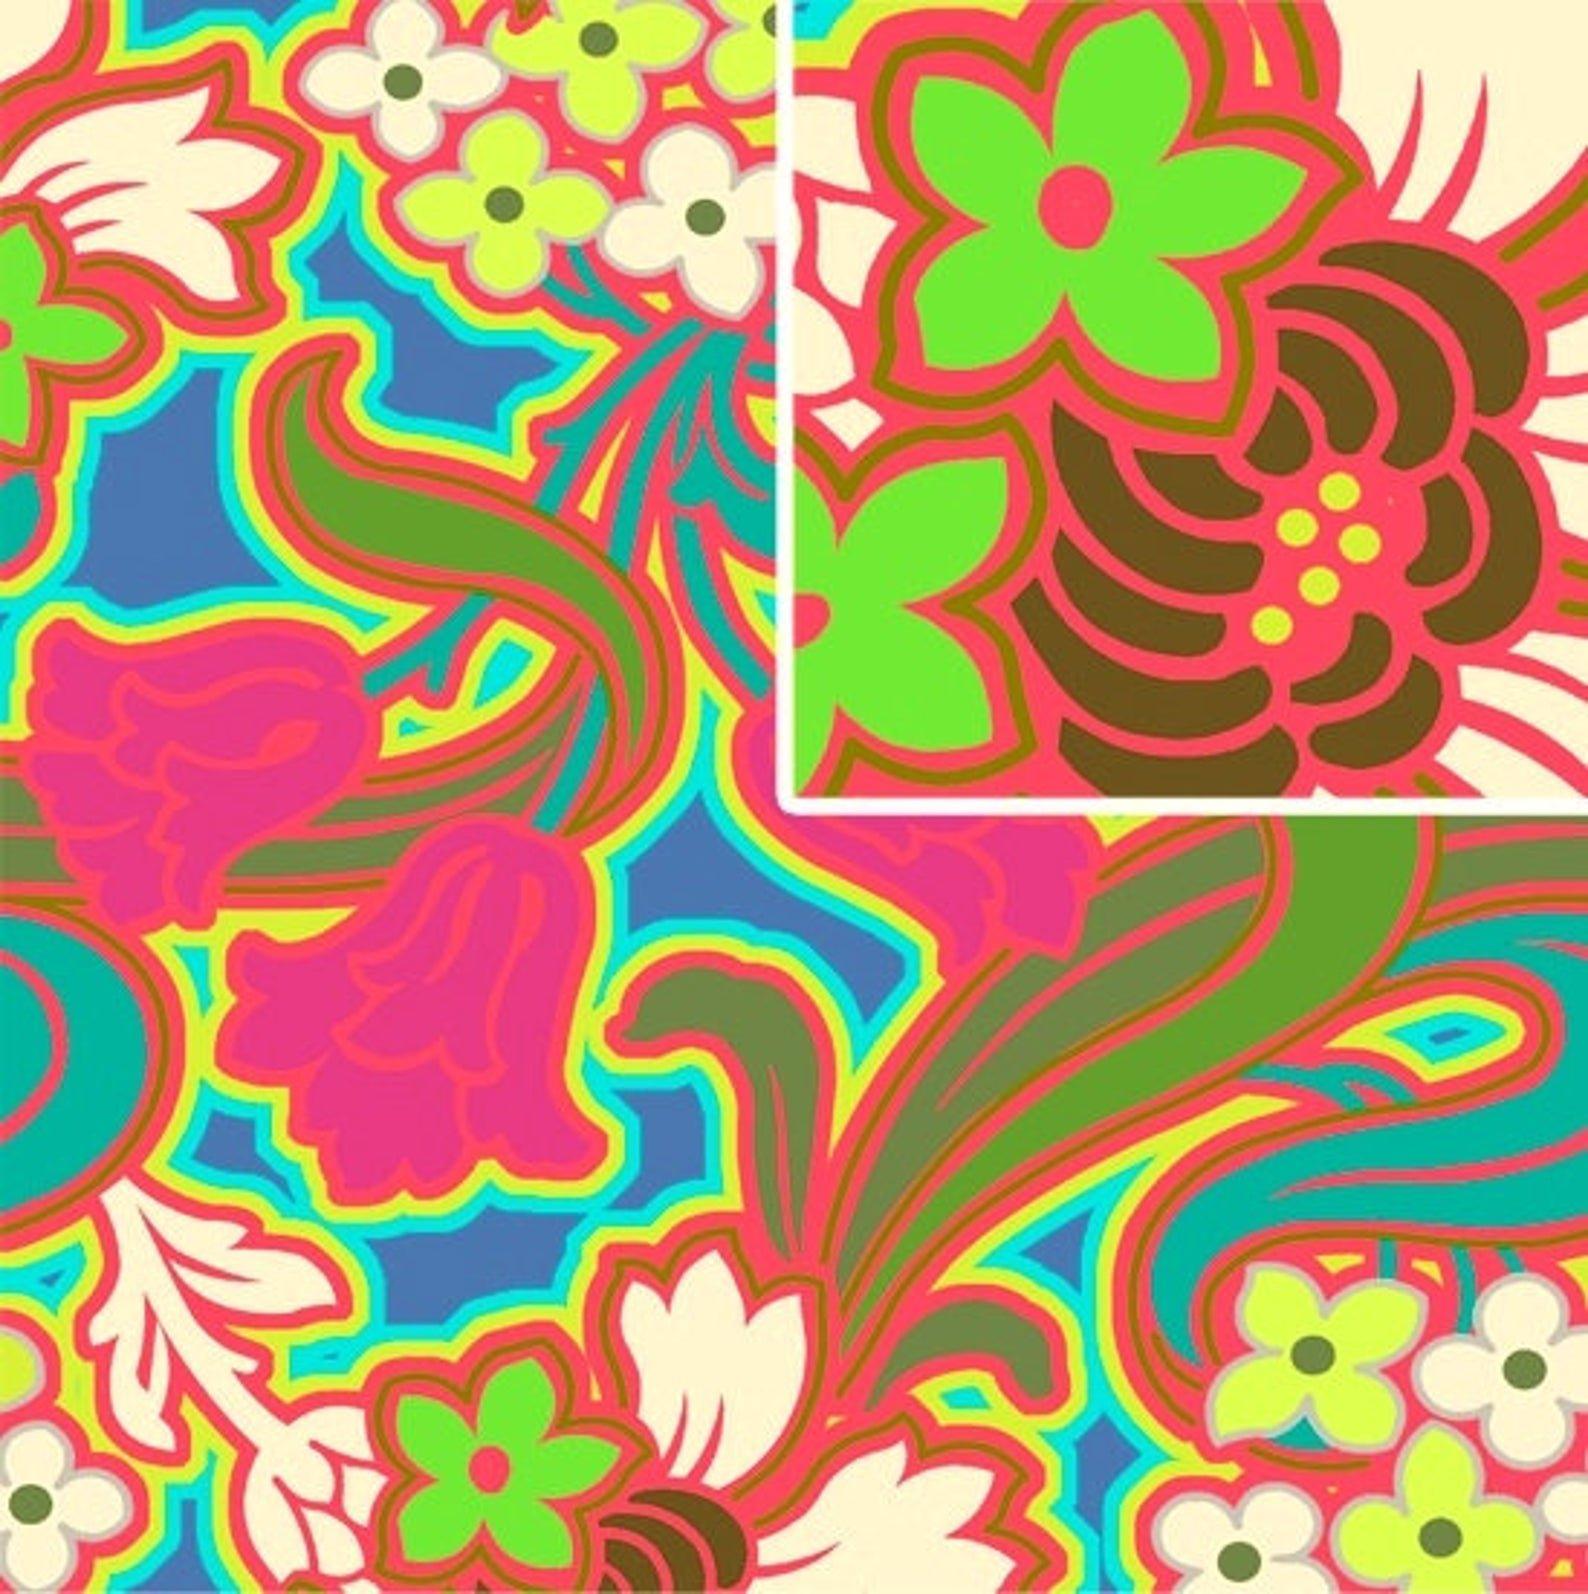 Disco Flower Hot Pink